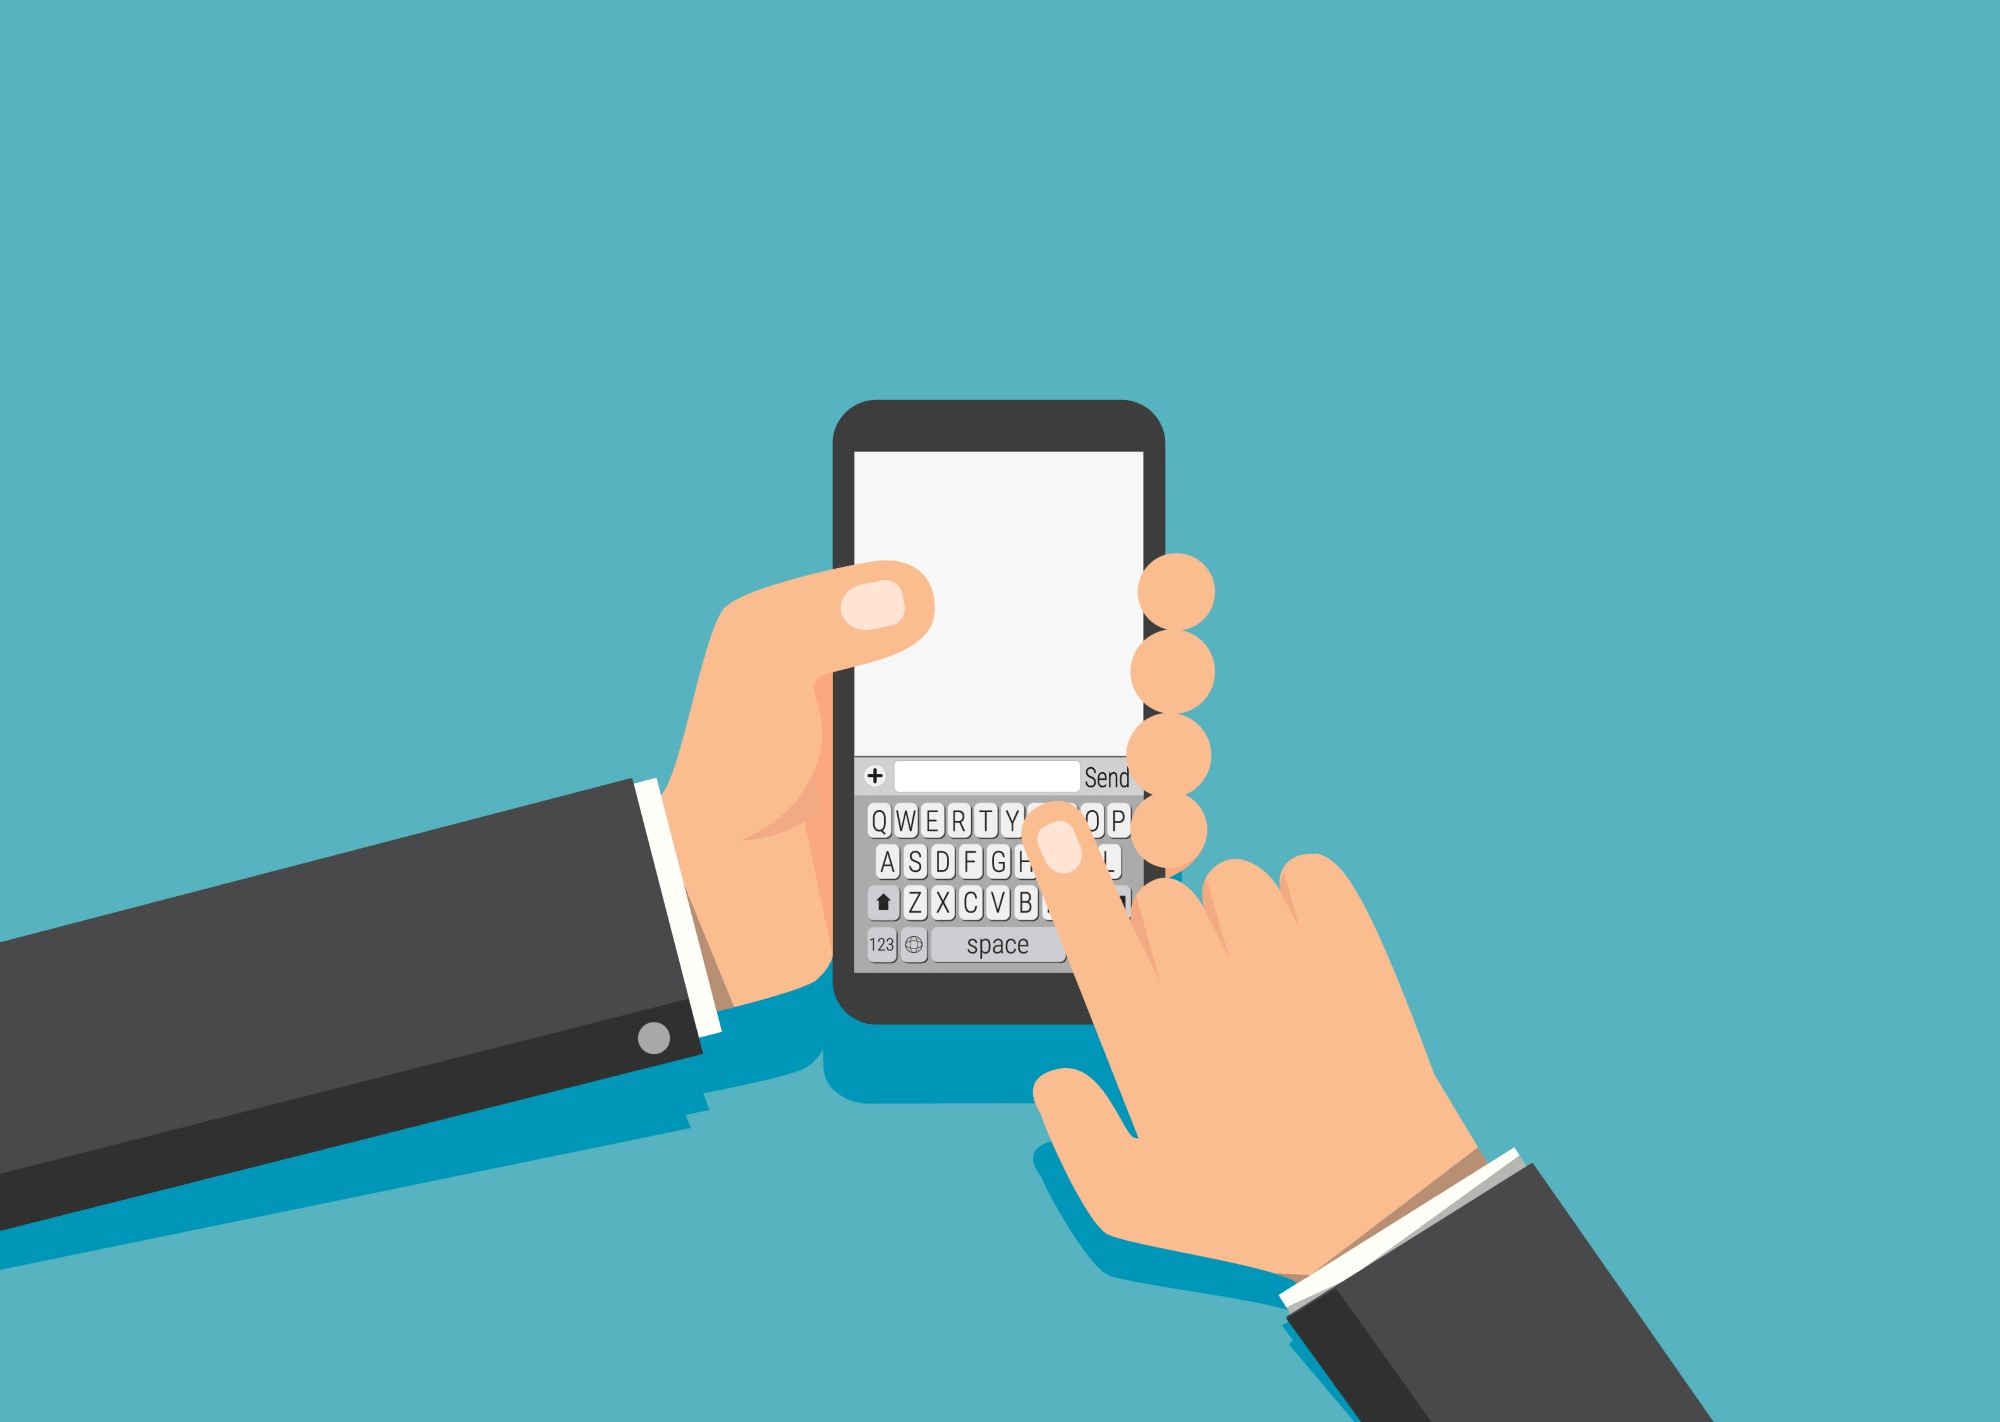 Клавиатура Gboard от Google для смартфона. Топ-7 функций